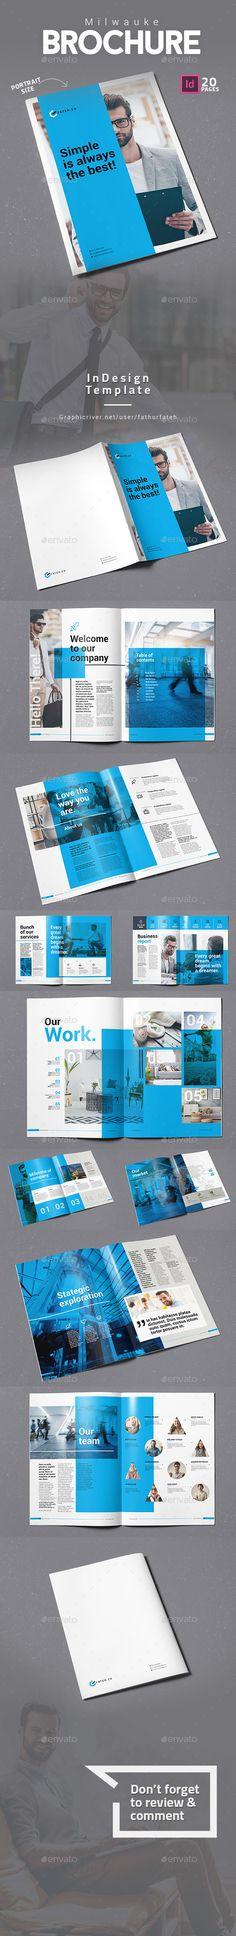 Milwauke Brochure